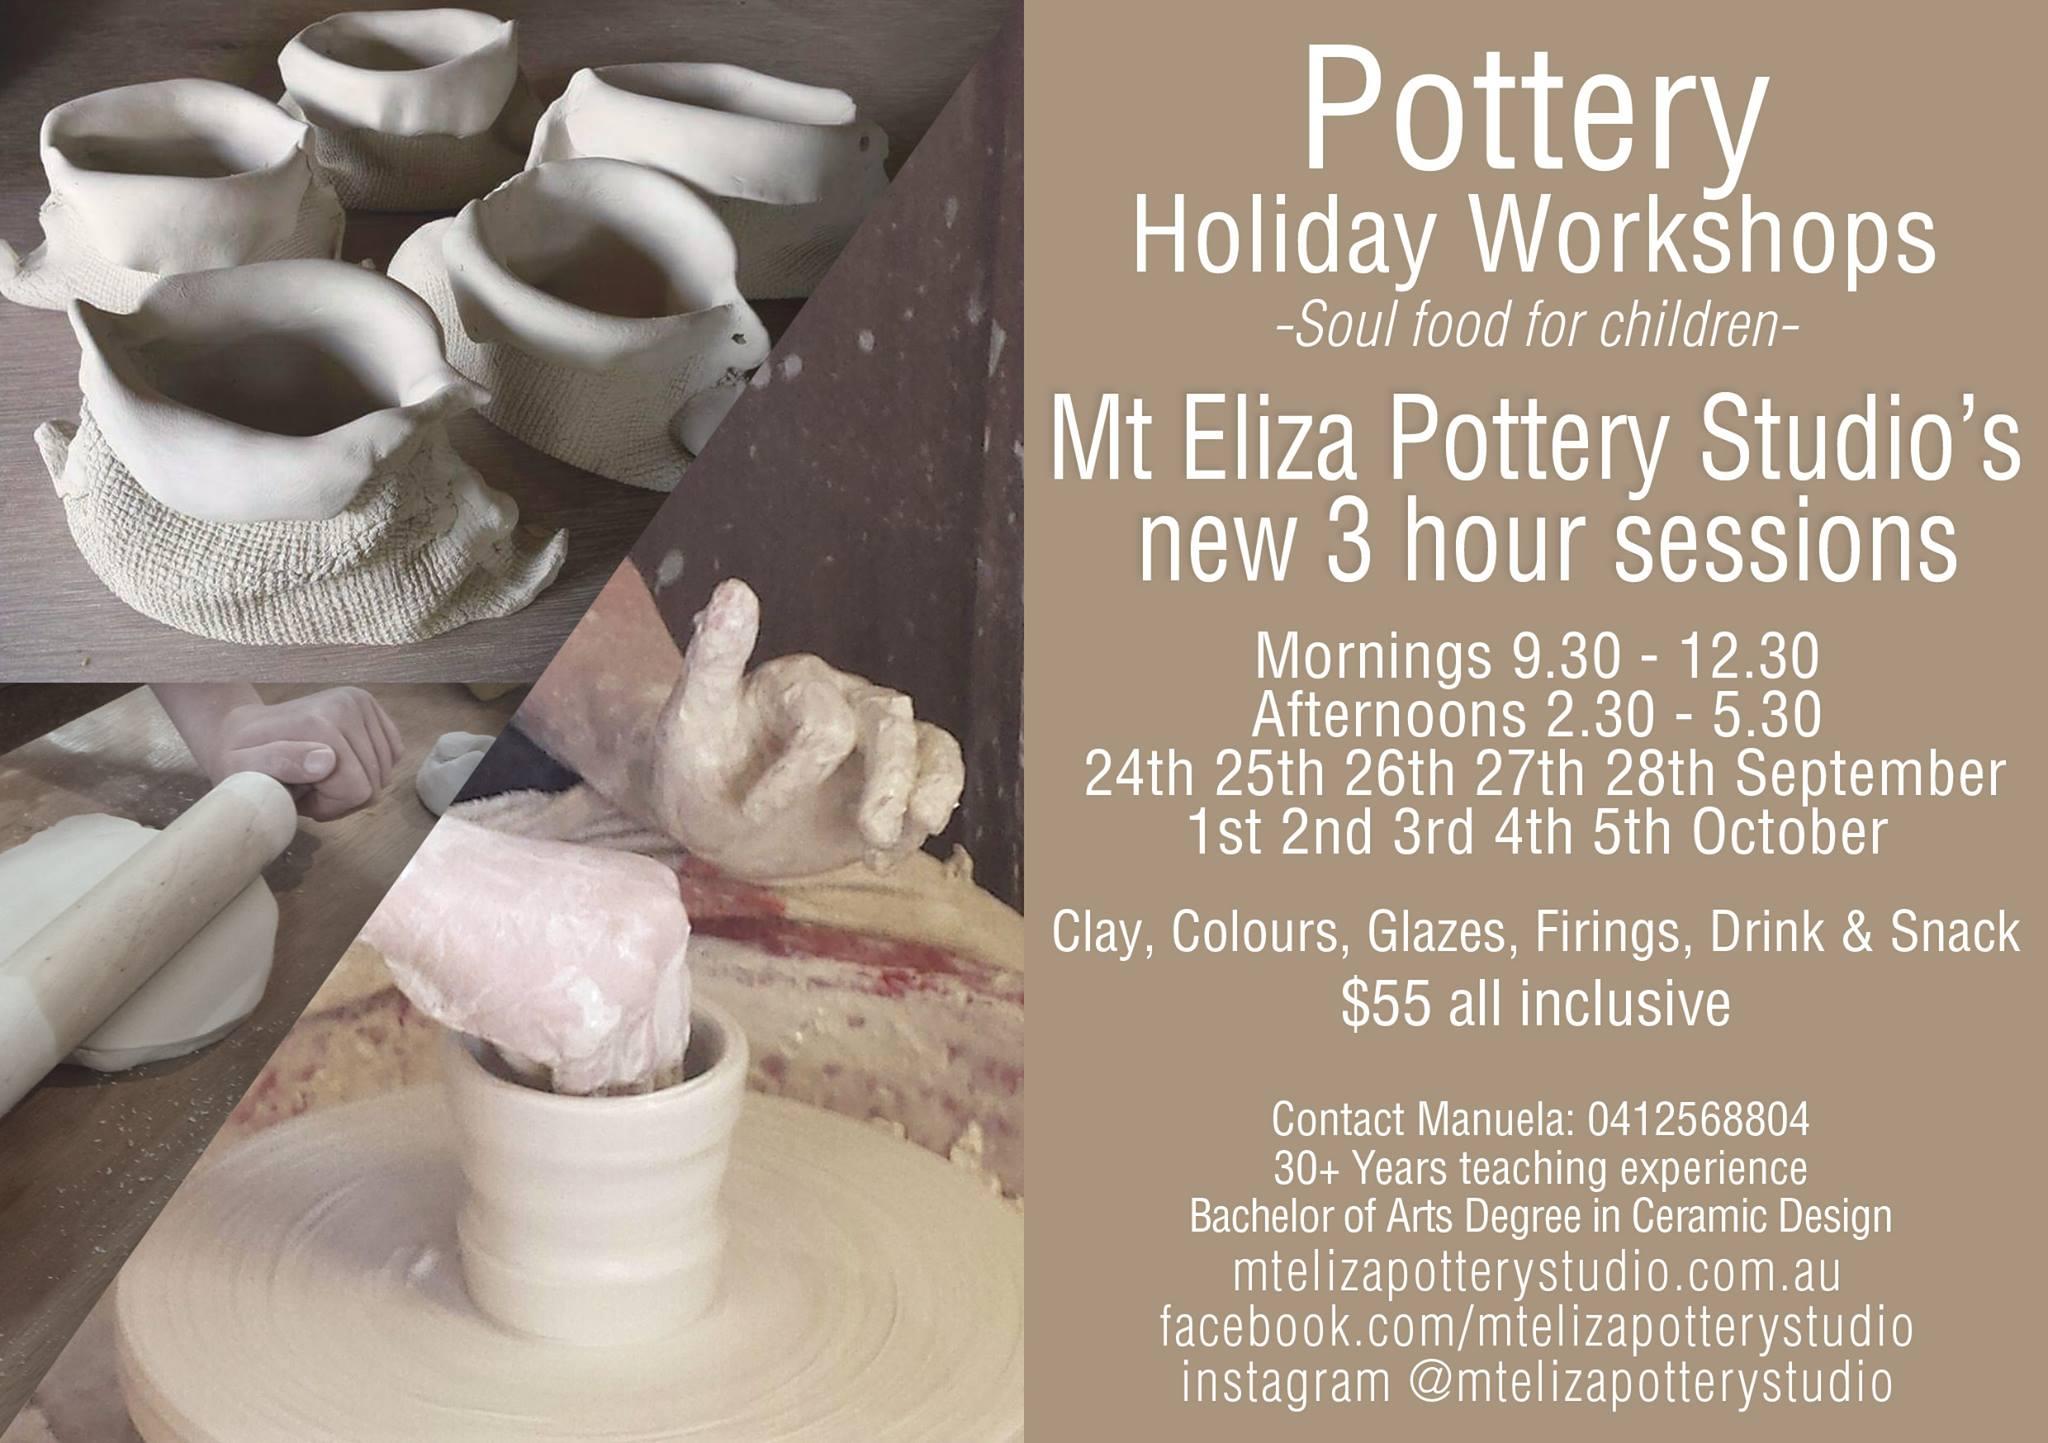 mt eliza pottery sep 2018.jpg